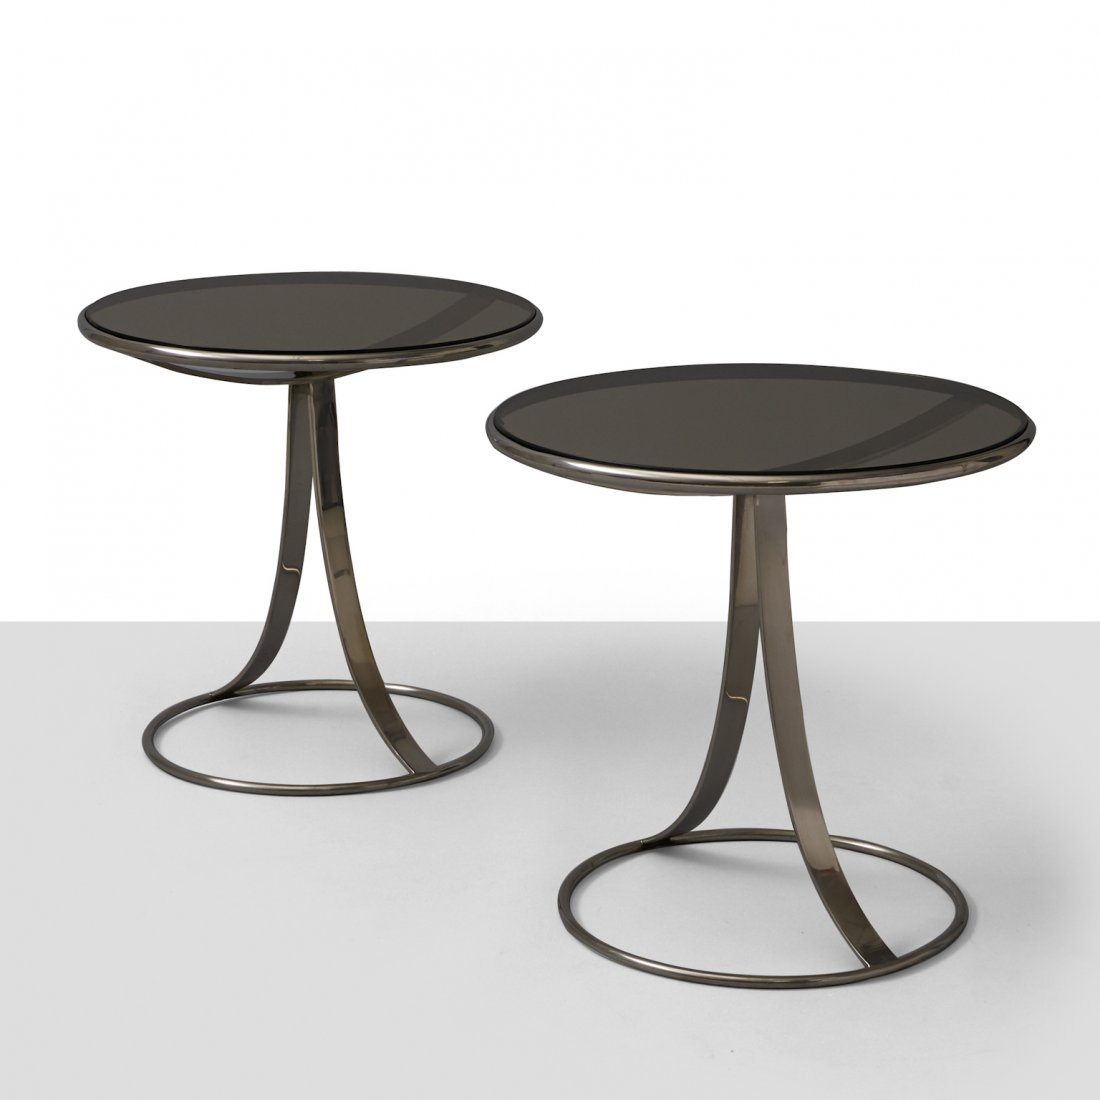 Gardner Leaver, SIde Tables